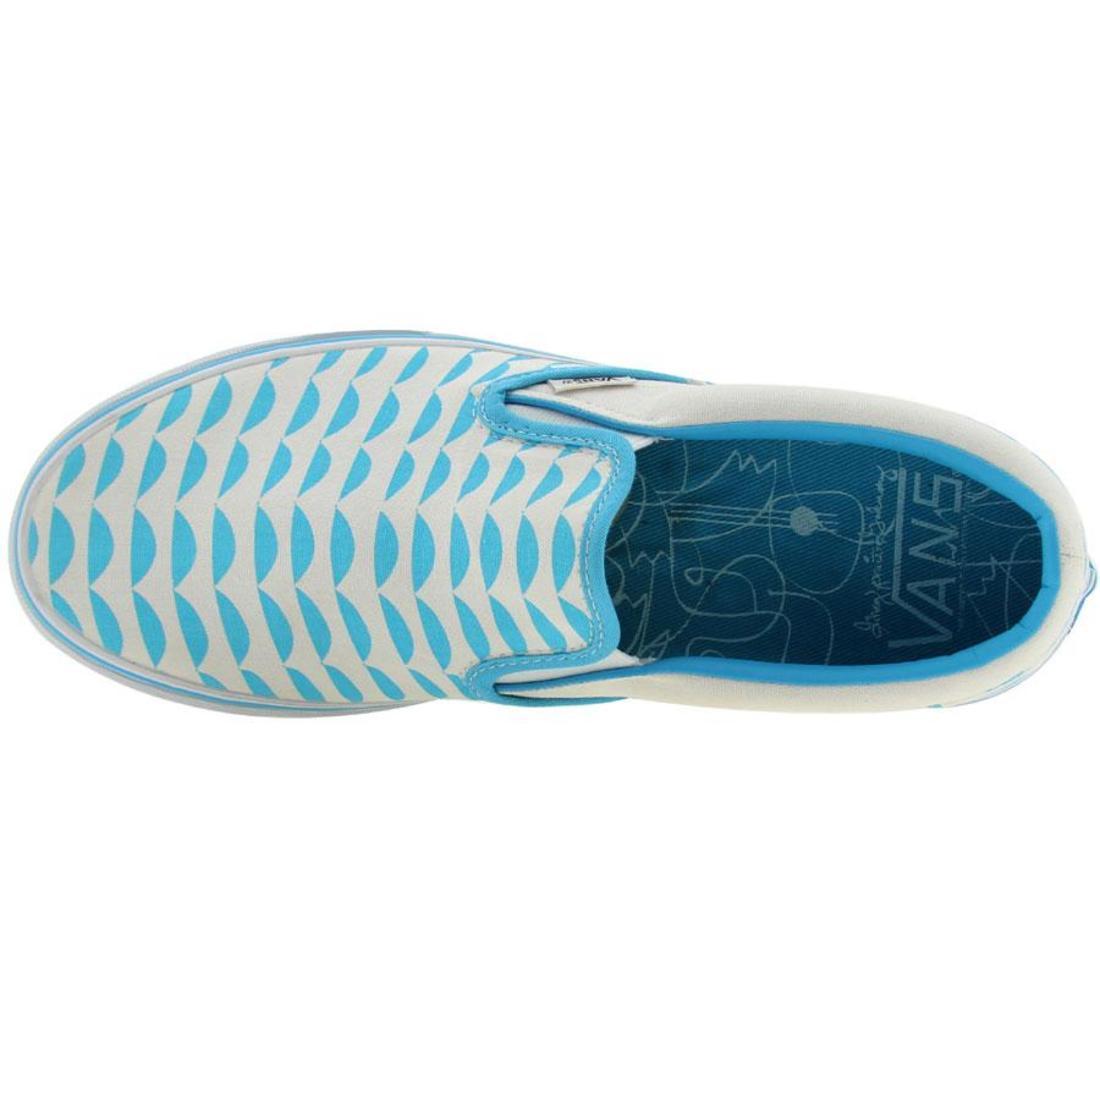 a1c9073eff5449 Vans Classic Slip-On LX - Galinsky Waves (aquarius   t white) 4 4 of 7 ...